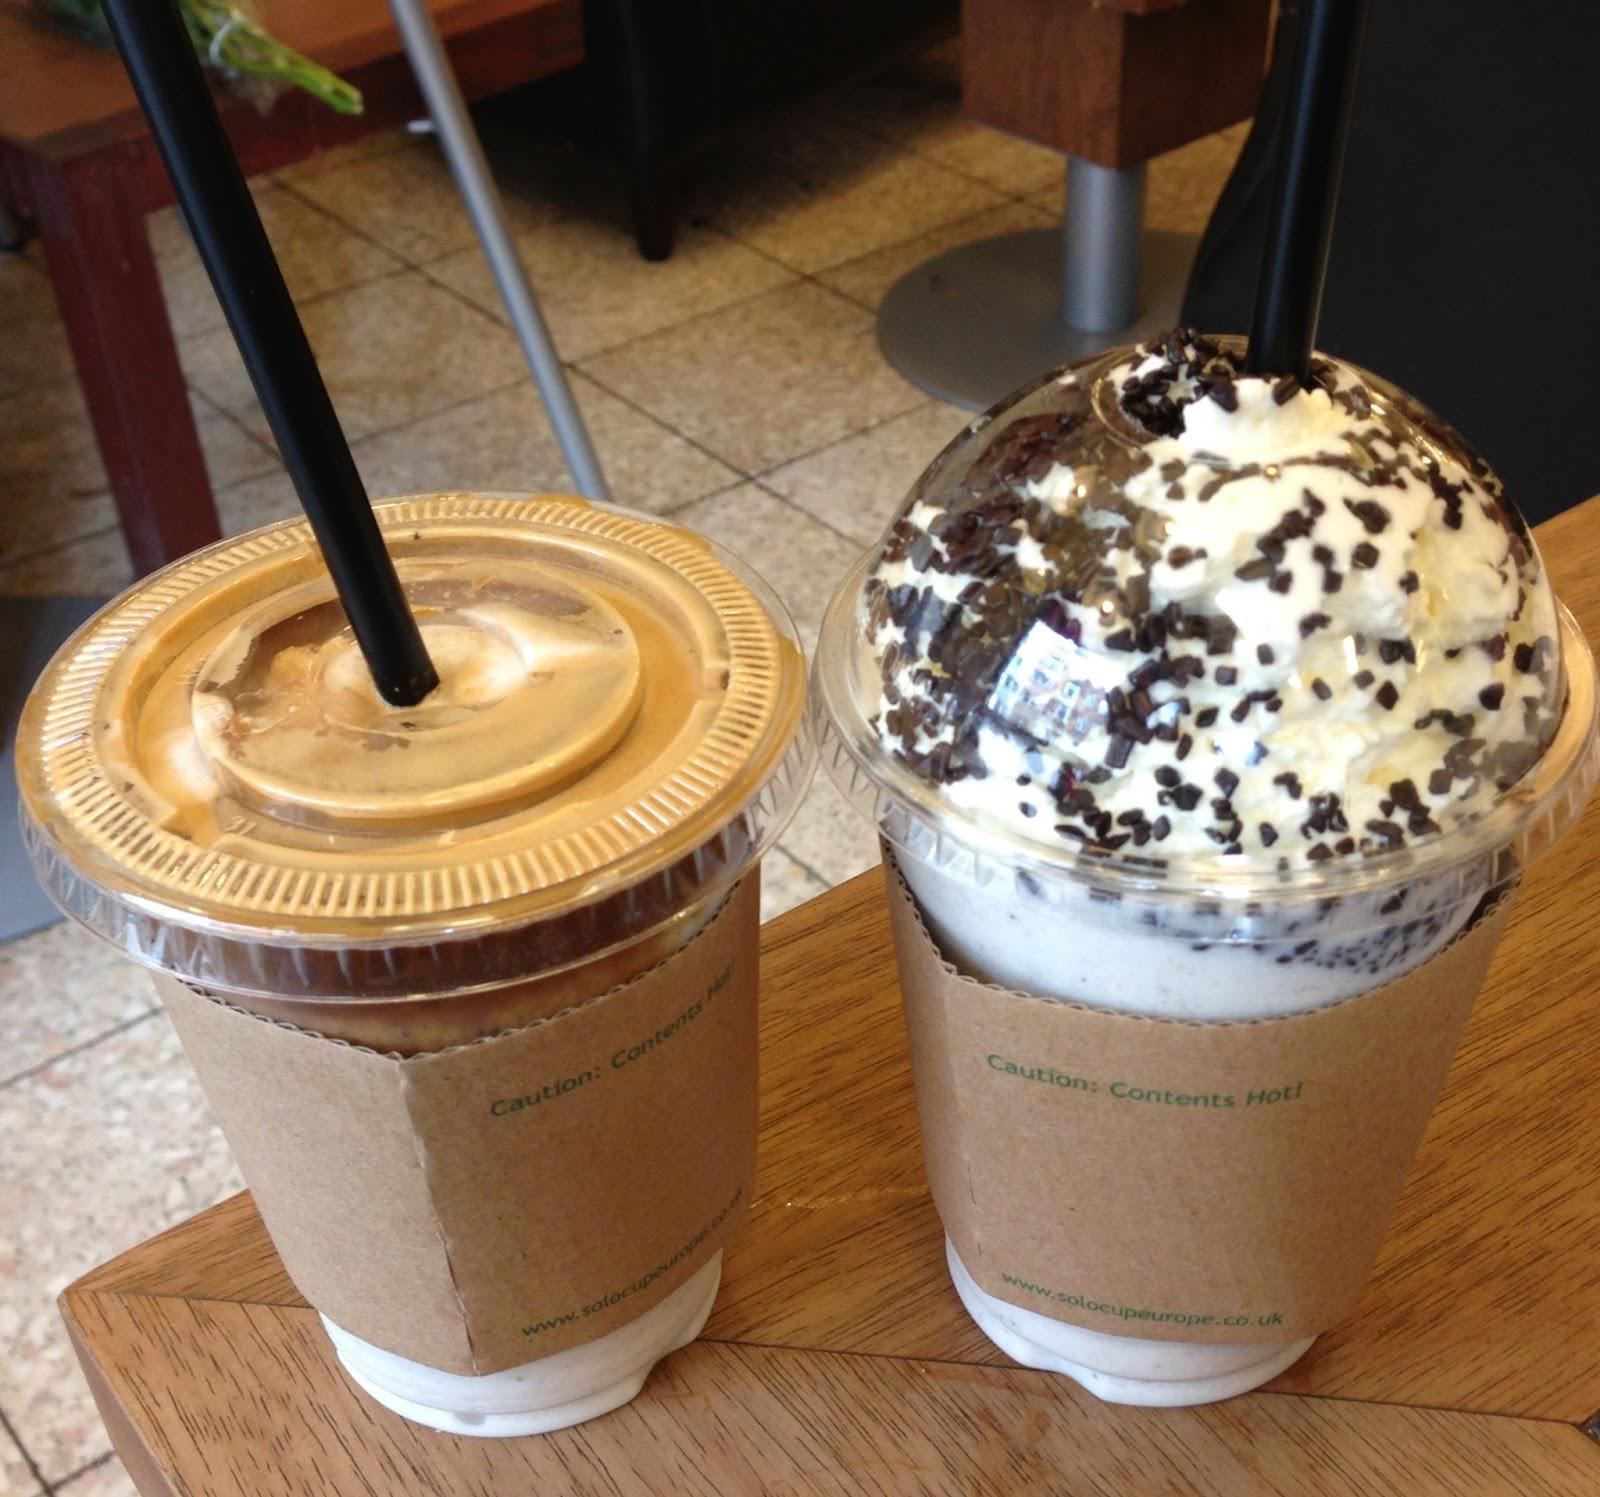 Baresso Coffee, kaffe, gelato, flødeskum, latte, cafe, fredag, sommer, hygge, kæreste